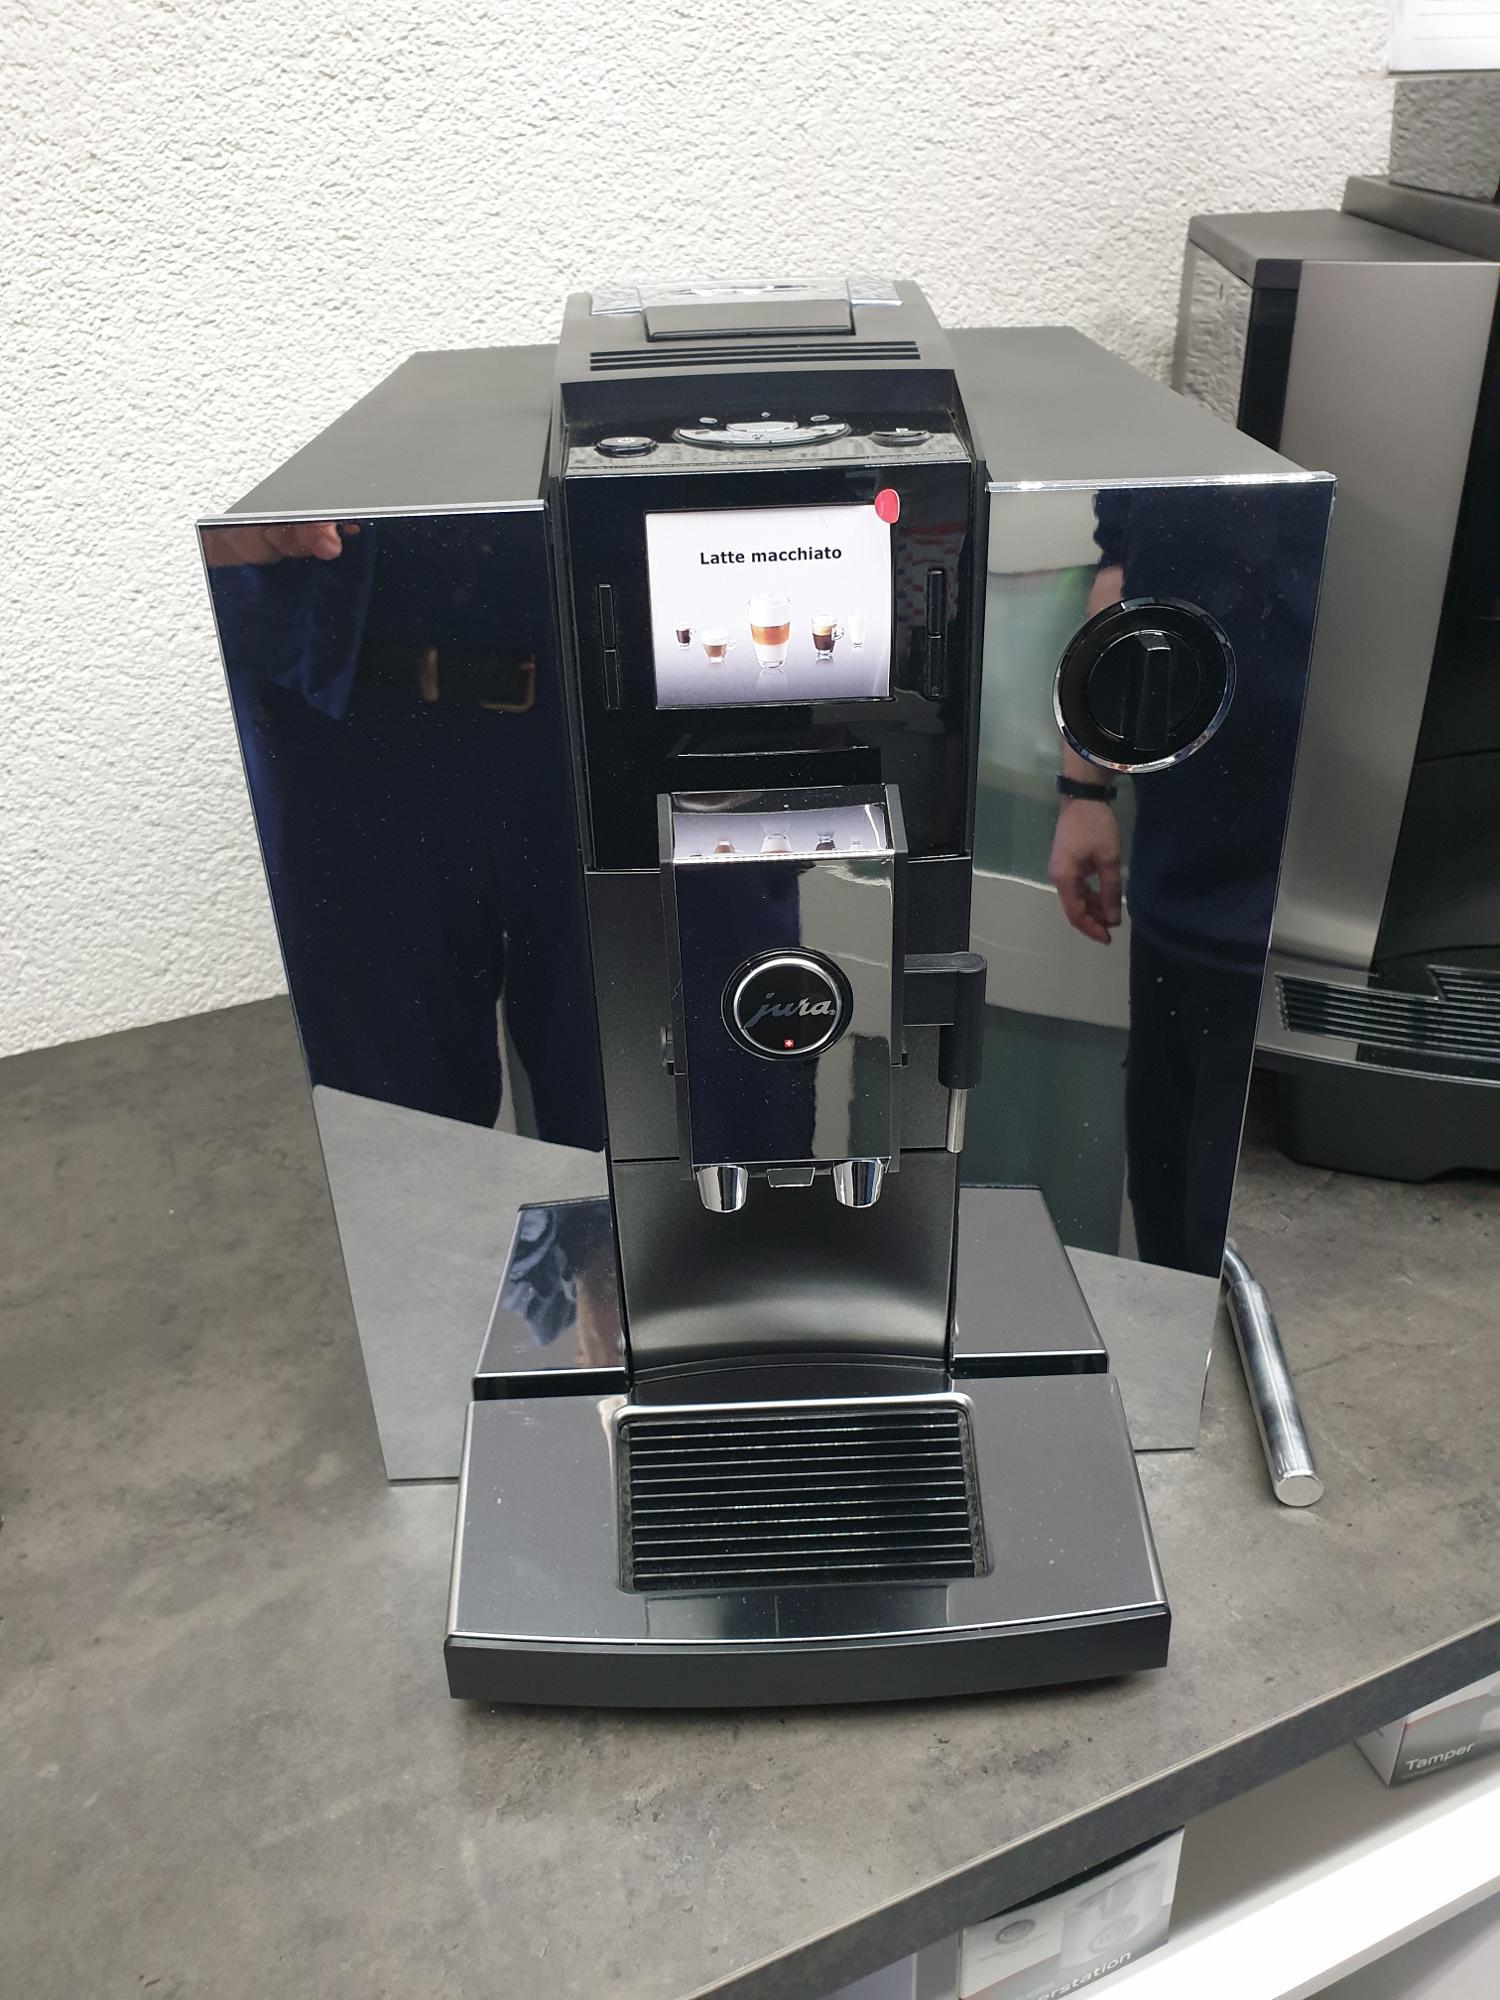 Becker GmbH | Hausgeräte, Kaffeeautomaten & Siebträger